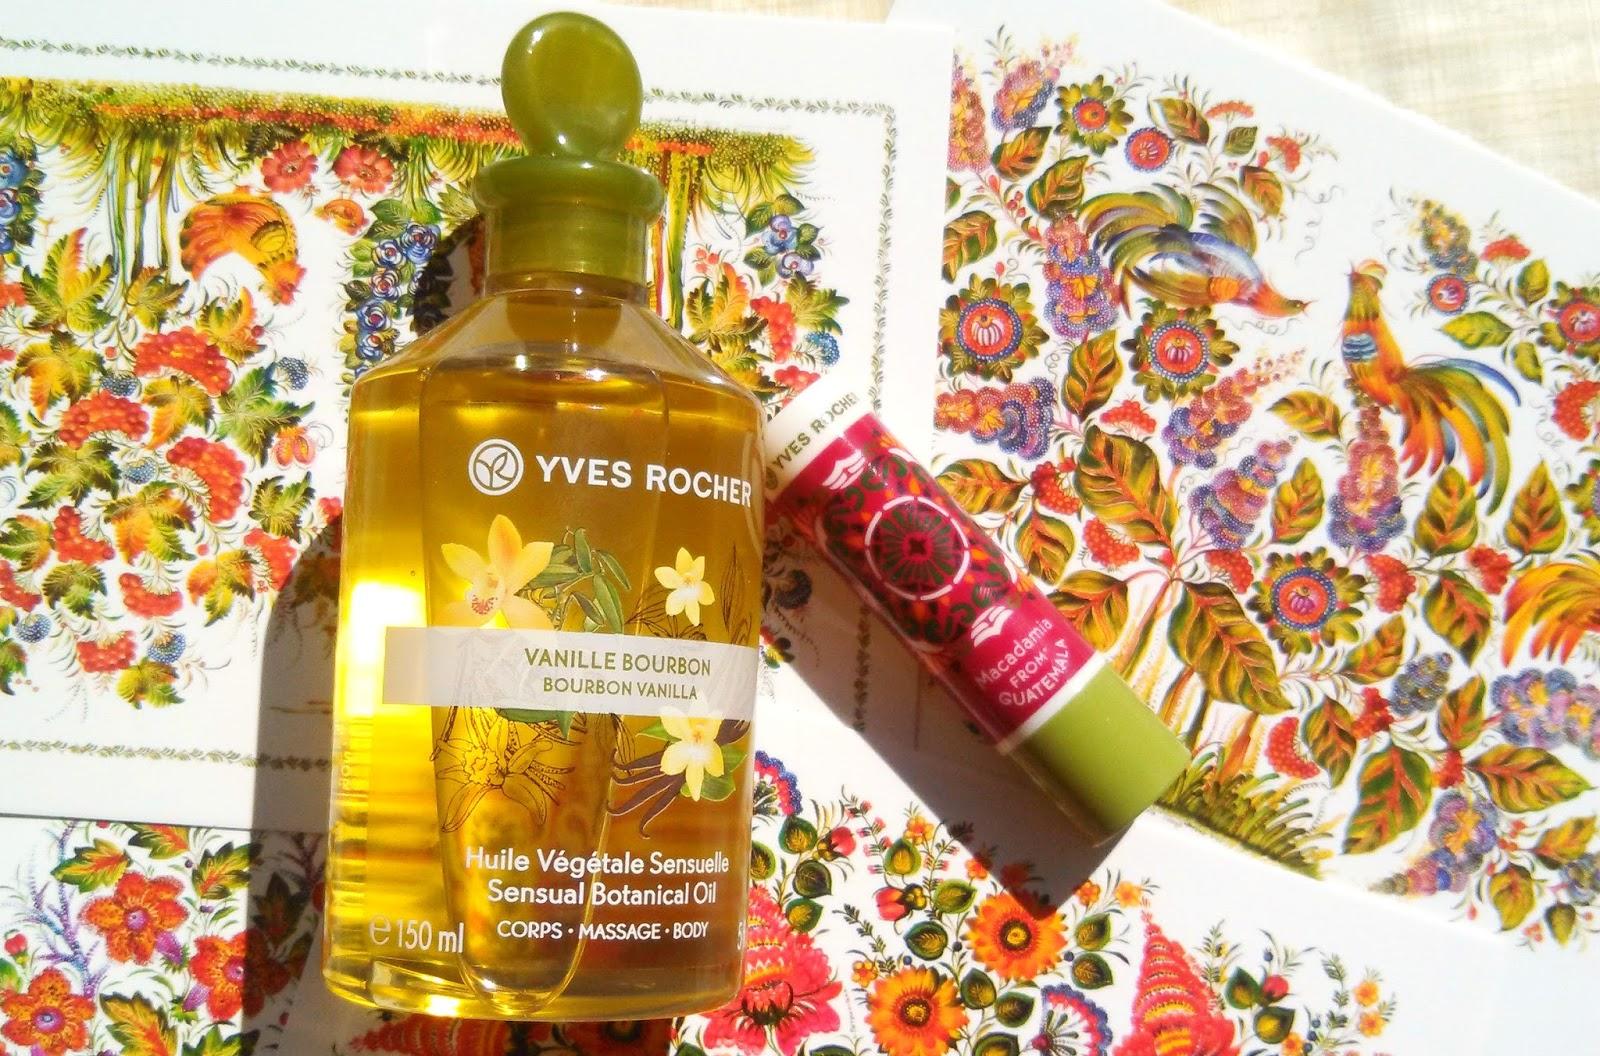 kireikana yves rocher bourbon vanilla massage oil. Black Bedroom Furniture Sets. Home Design Ideas